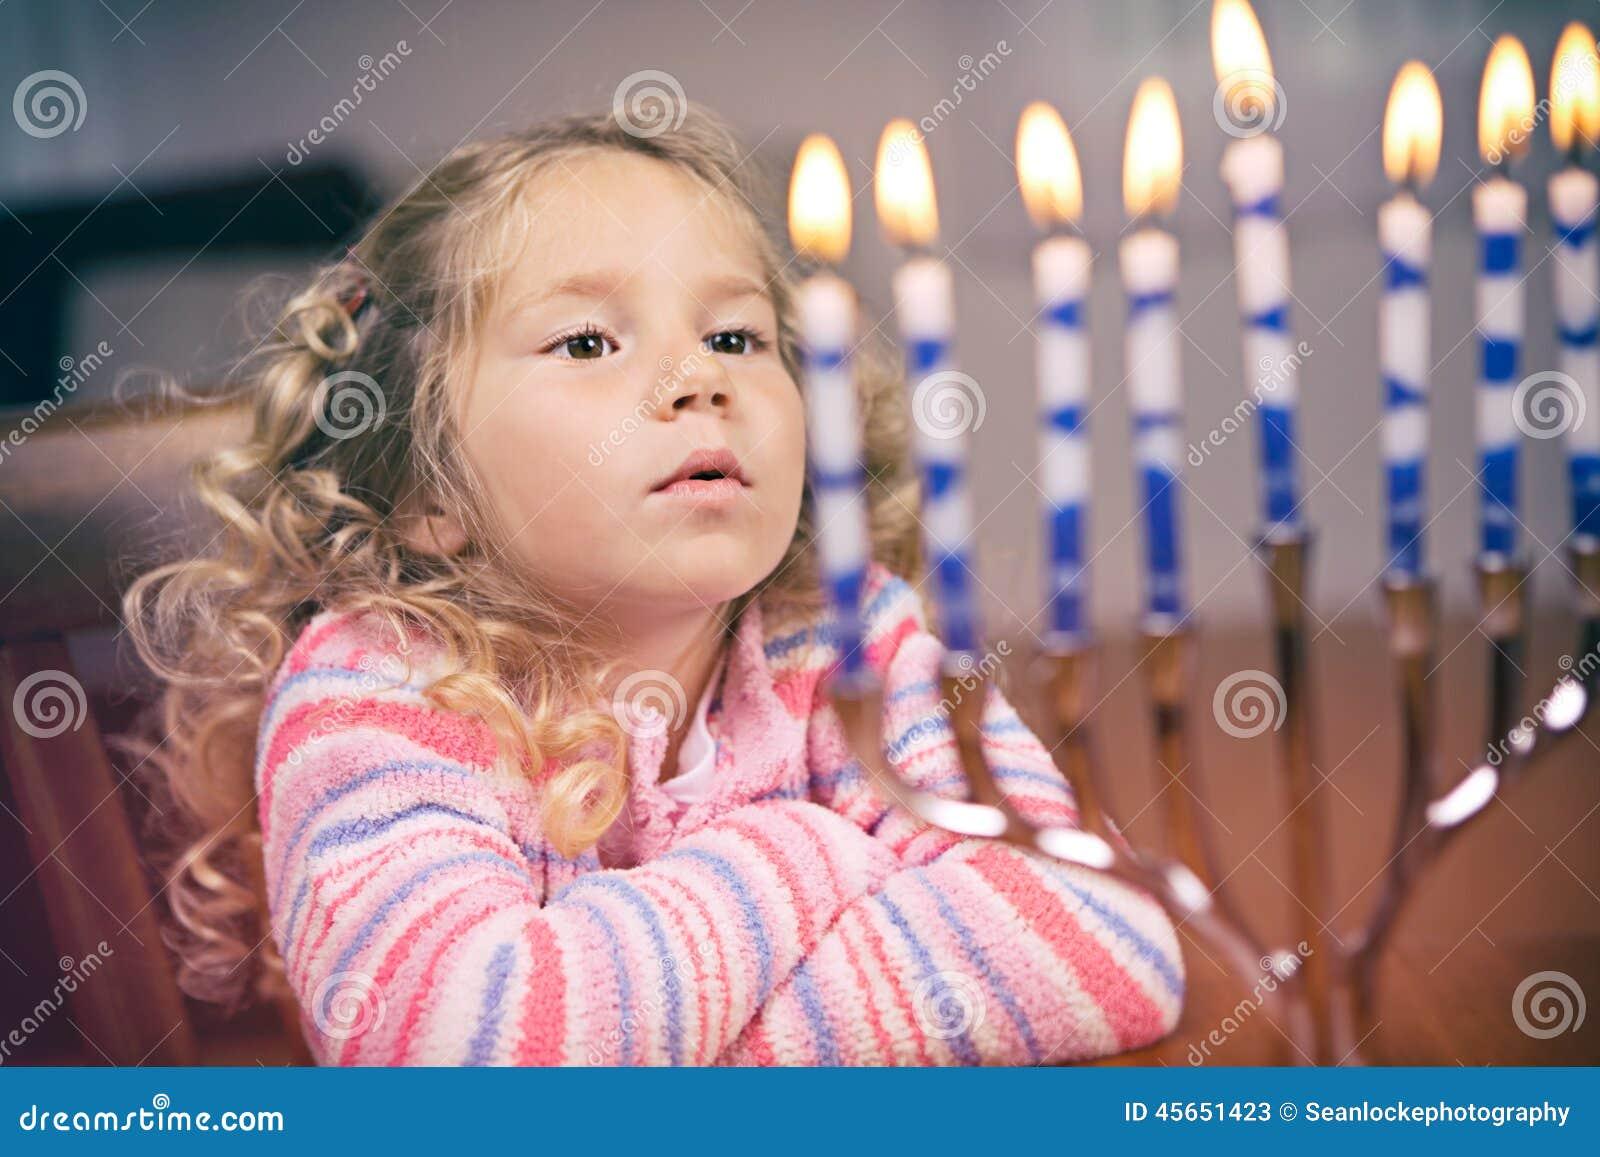 Hanoucca : La petite fille regarde des bougies de Hanoucca de Lit